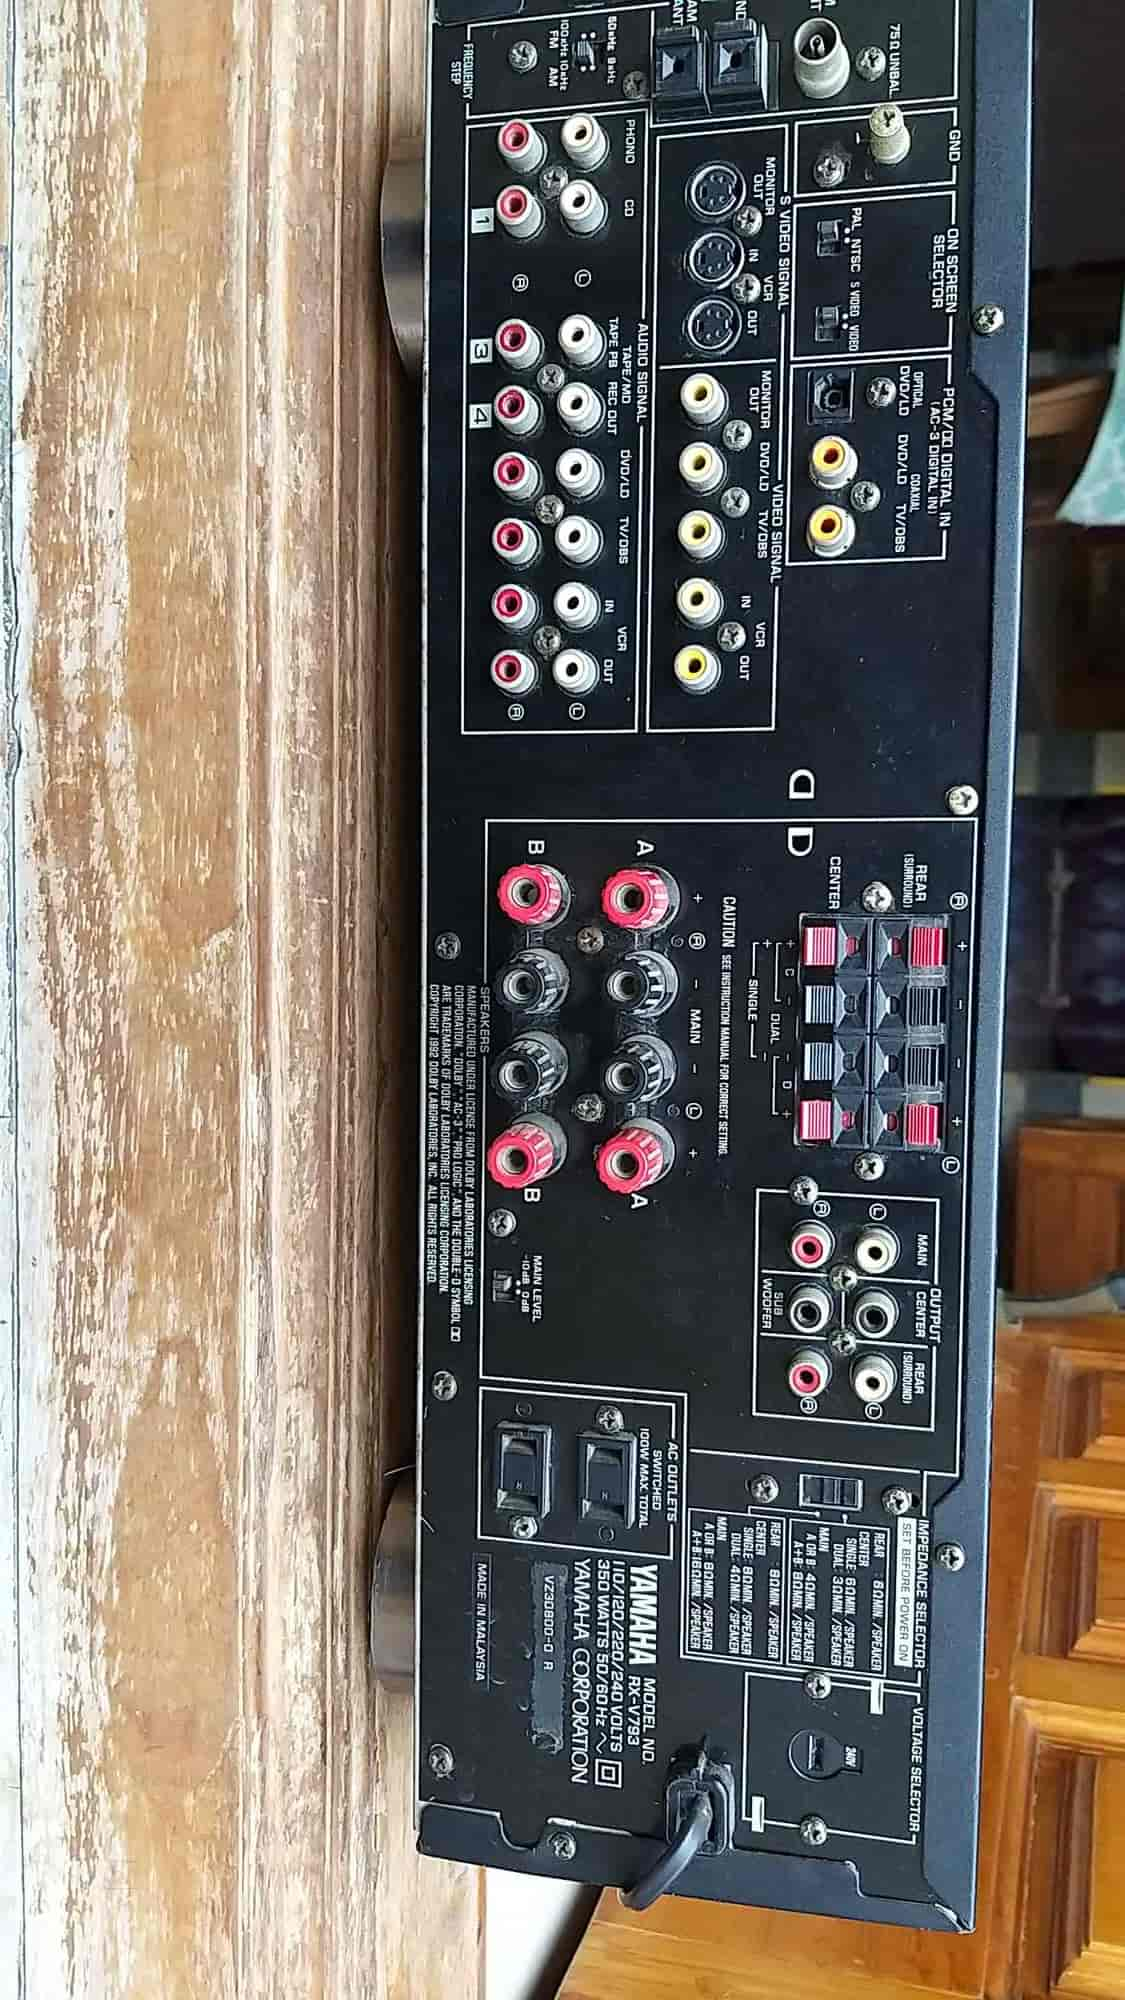 Pooja Electronics Triplicane Home Theatre System Repair